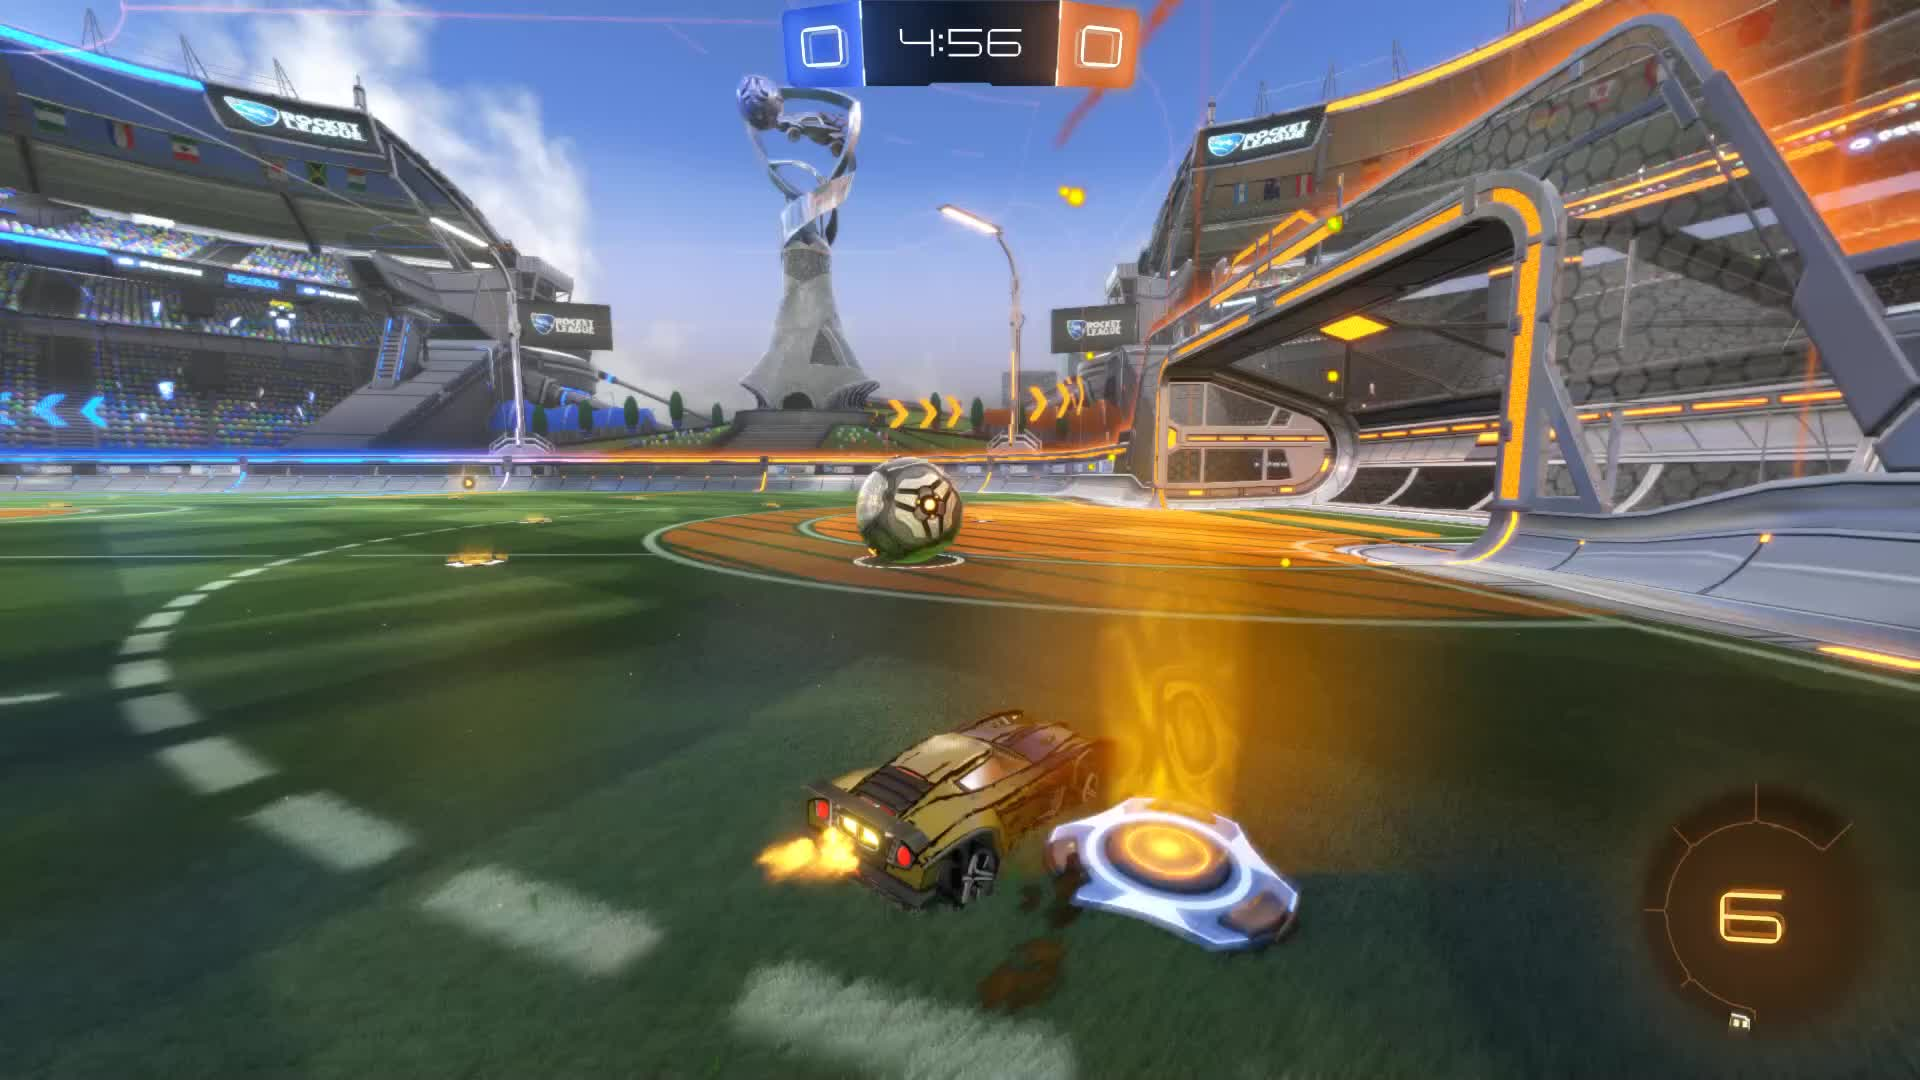 Gif Your Game, GifYourGame, Goal, Rocket League, RocketLeague, earray, Goal 1: earray GIFs